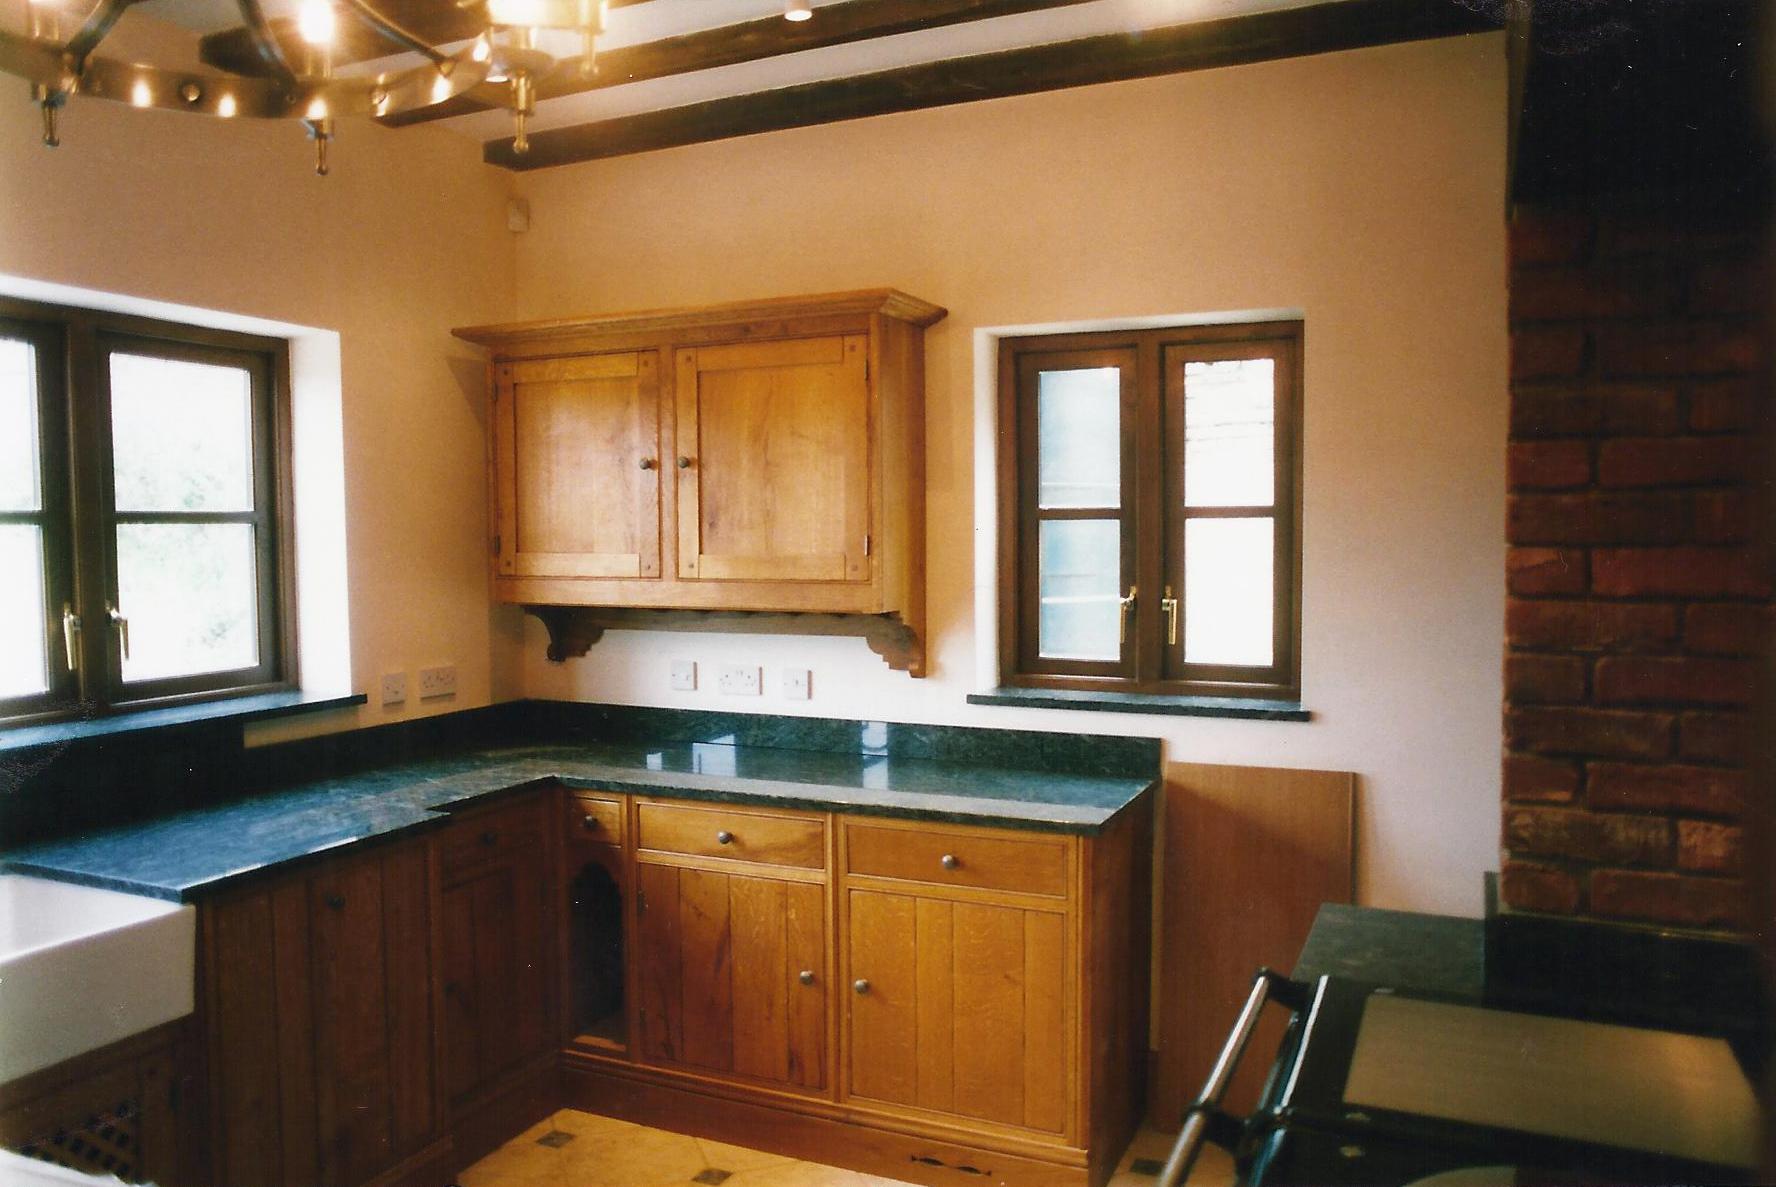 Kitchen Image 4 - North End Farm - East Yorkshire Architects - Samuel Kendall Associates